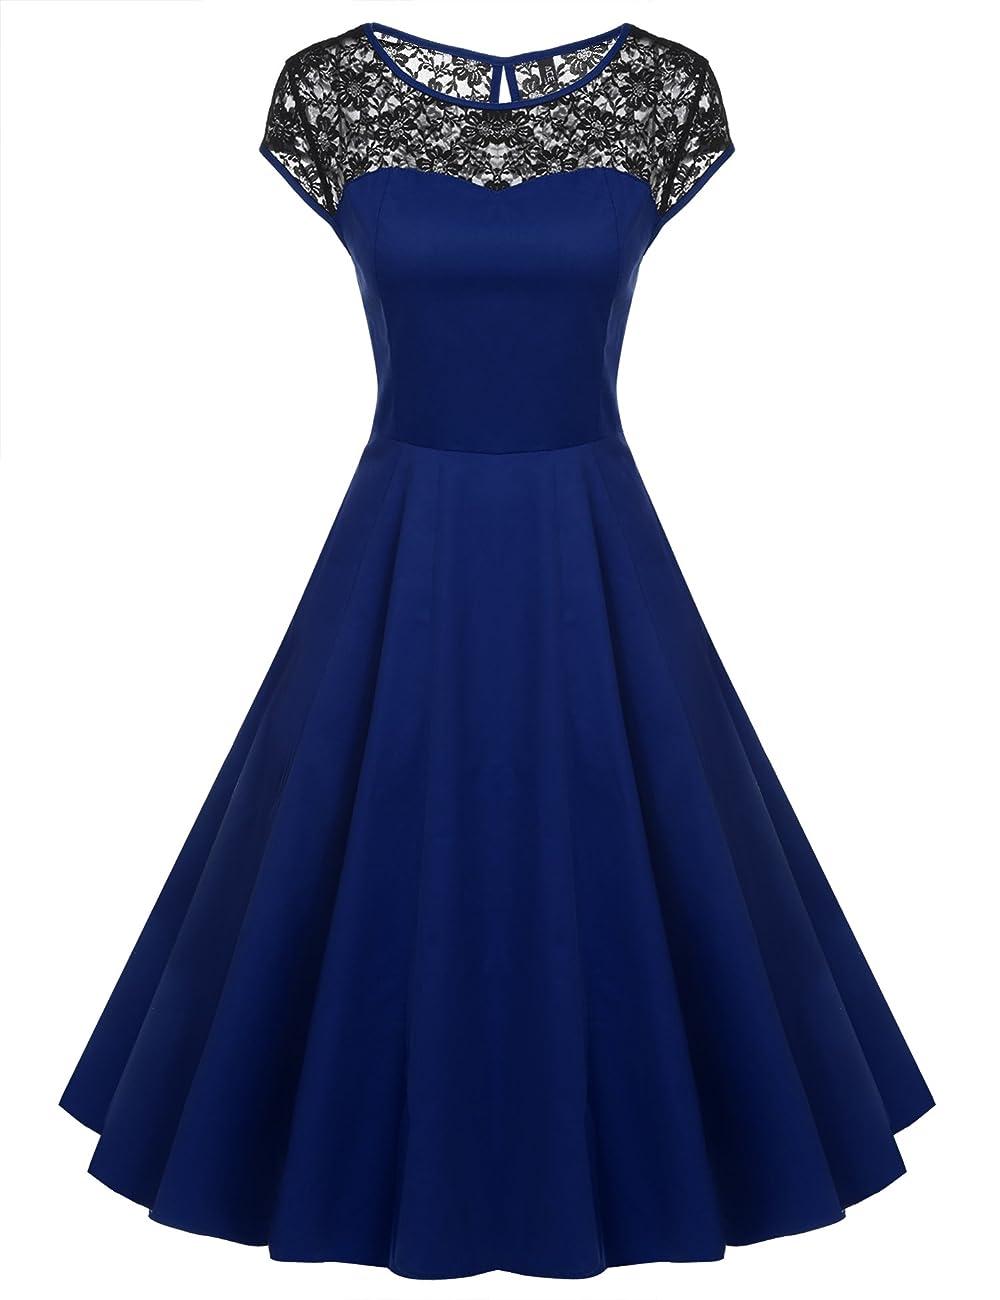 ACEVOG Women's Lace Crochet Sleeveless Cotton Vintage Tea Dress 0